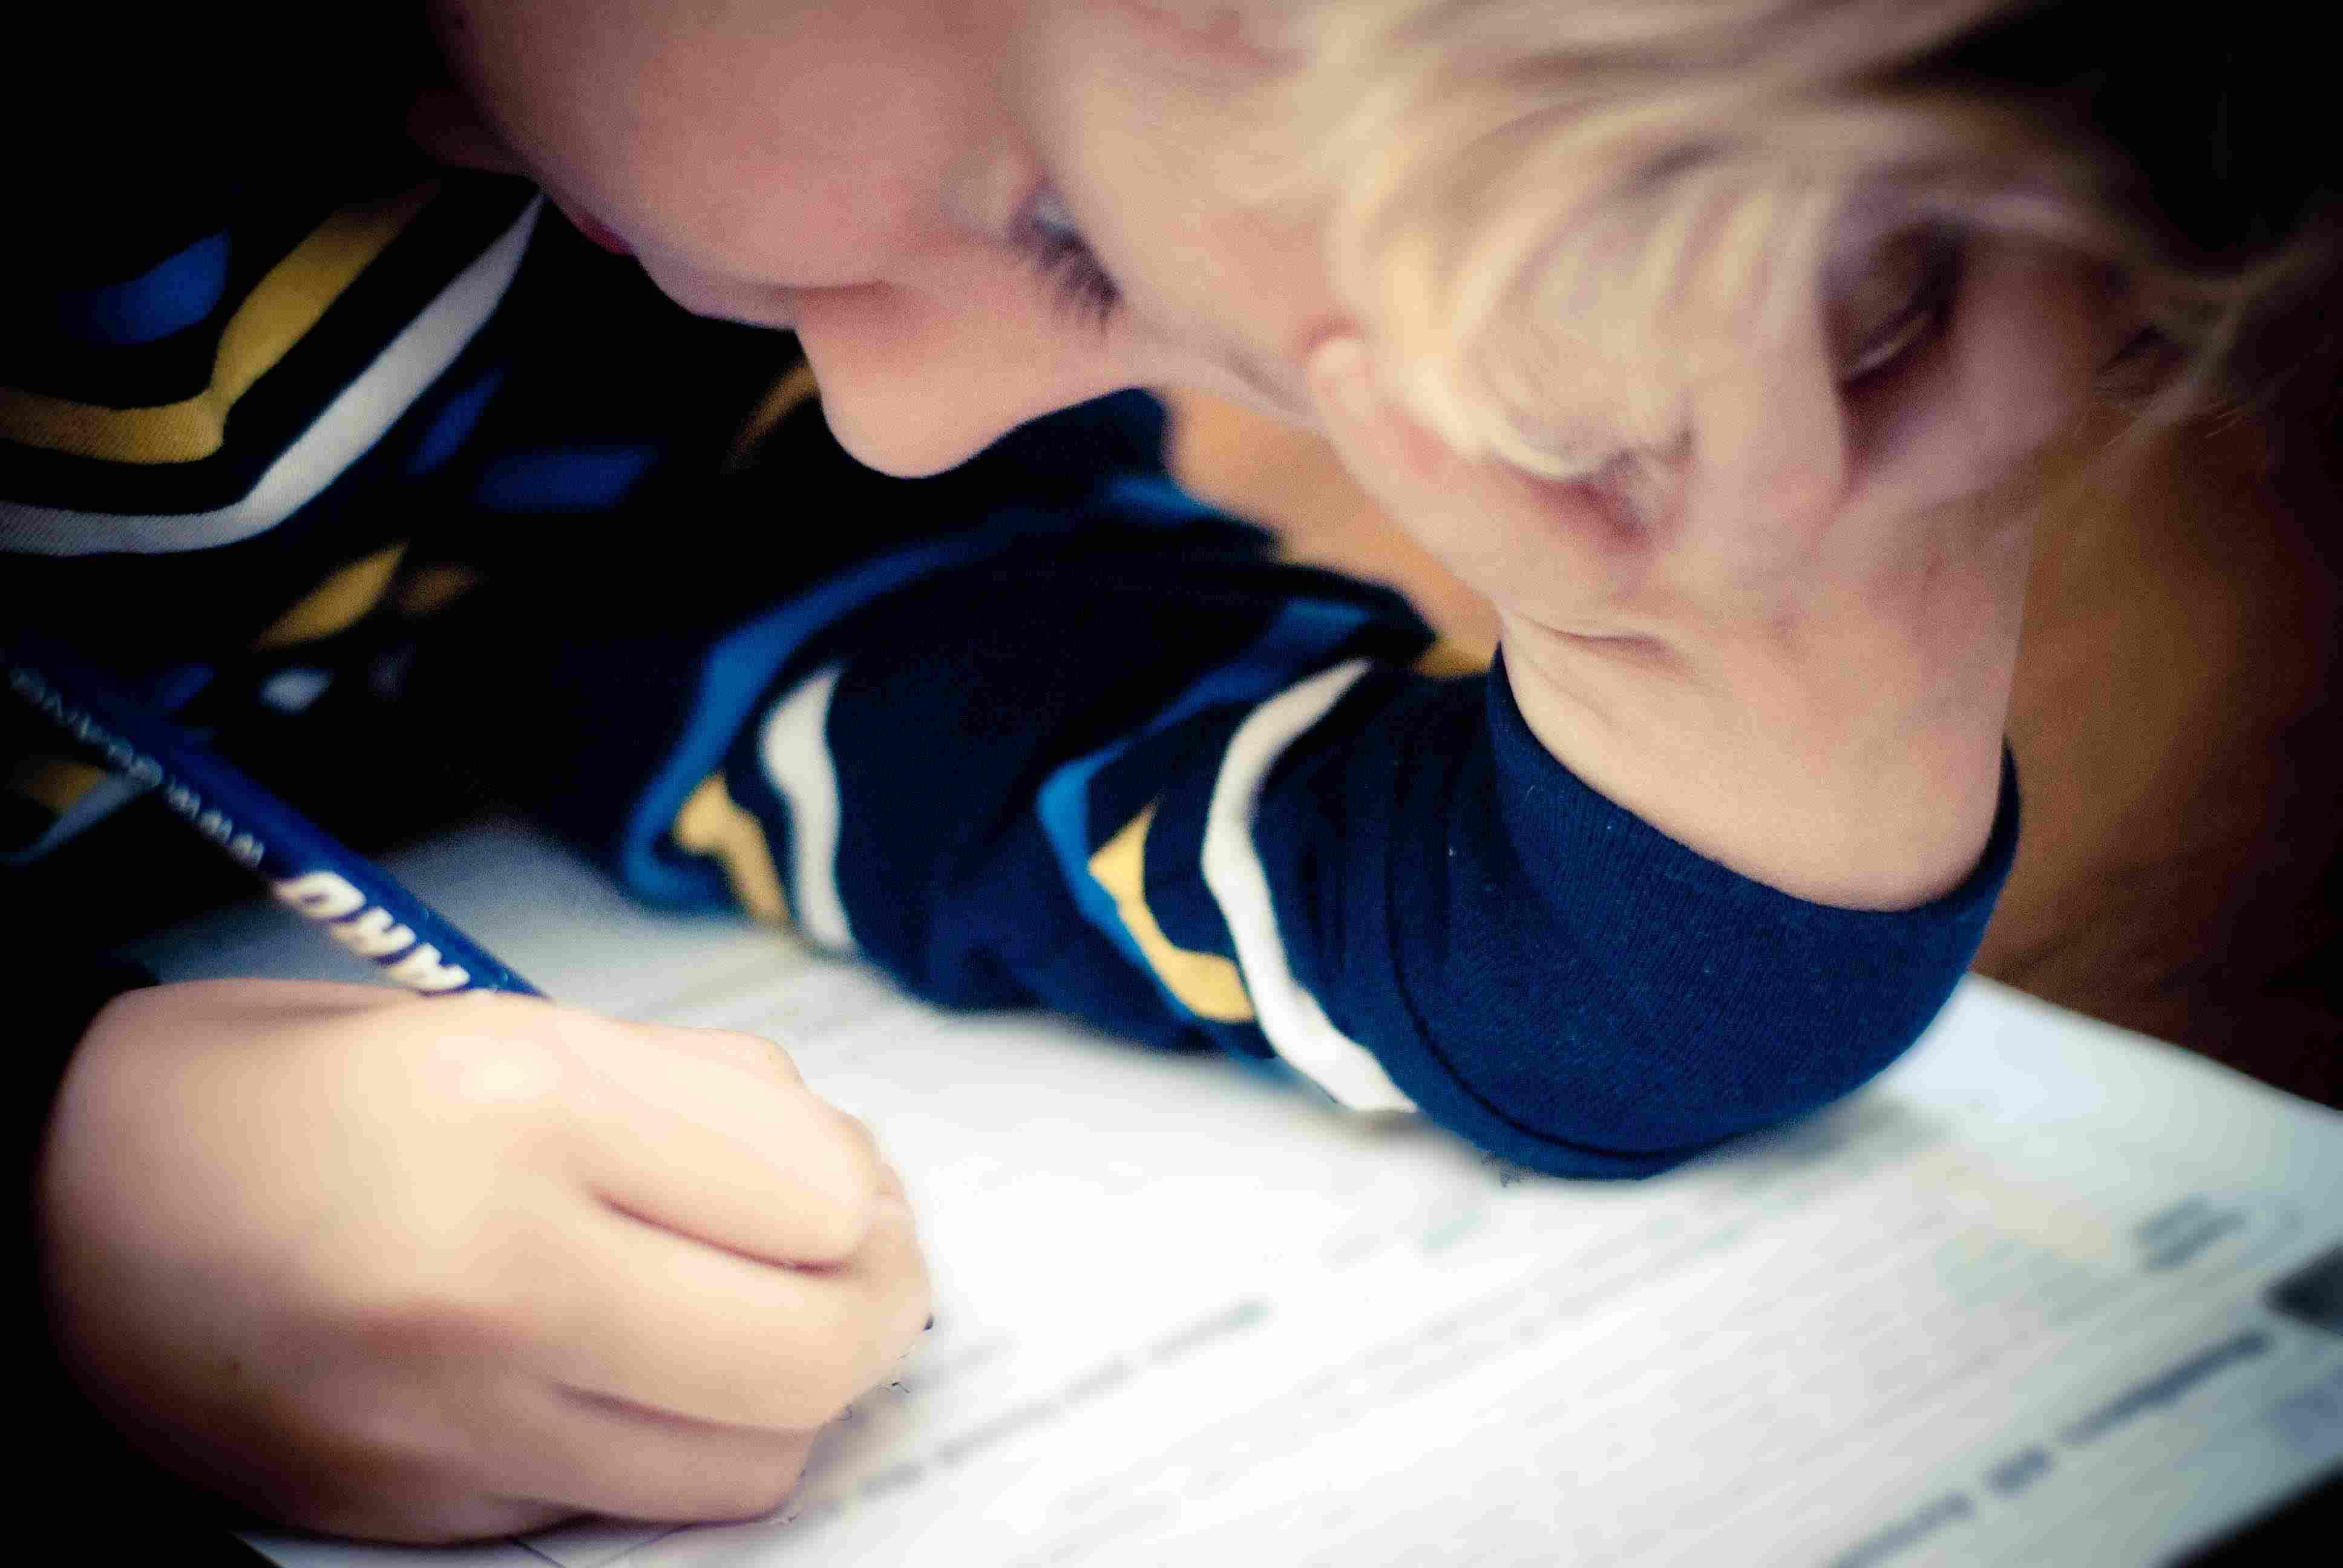 A boy completes a school worksheet